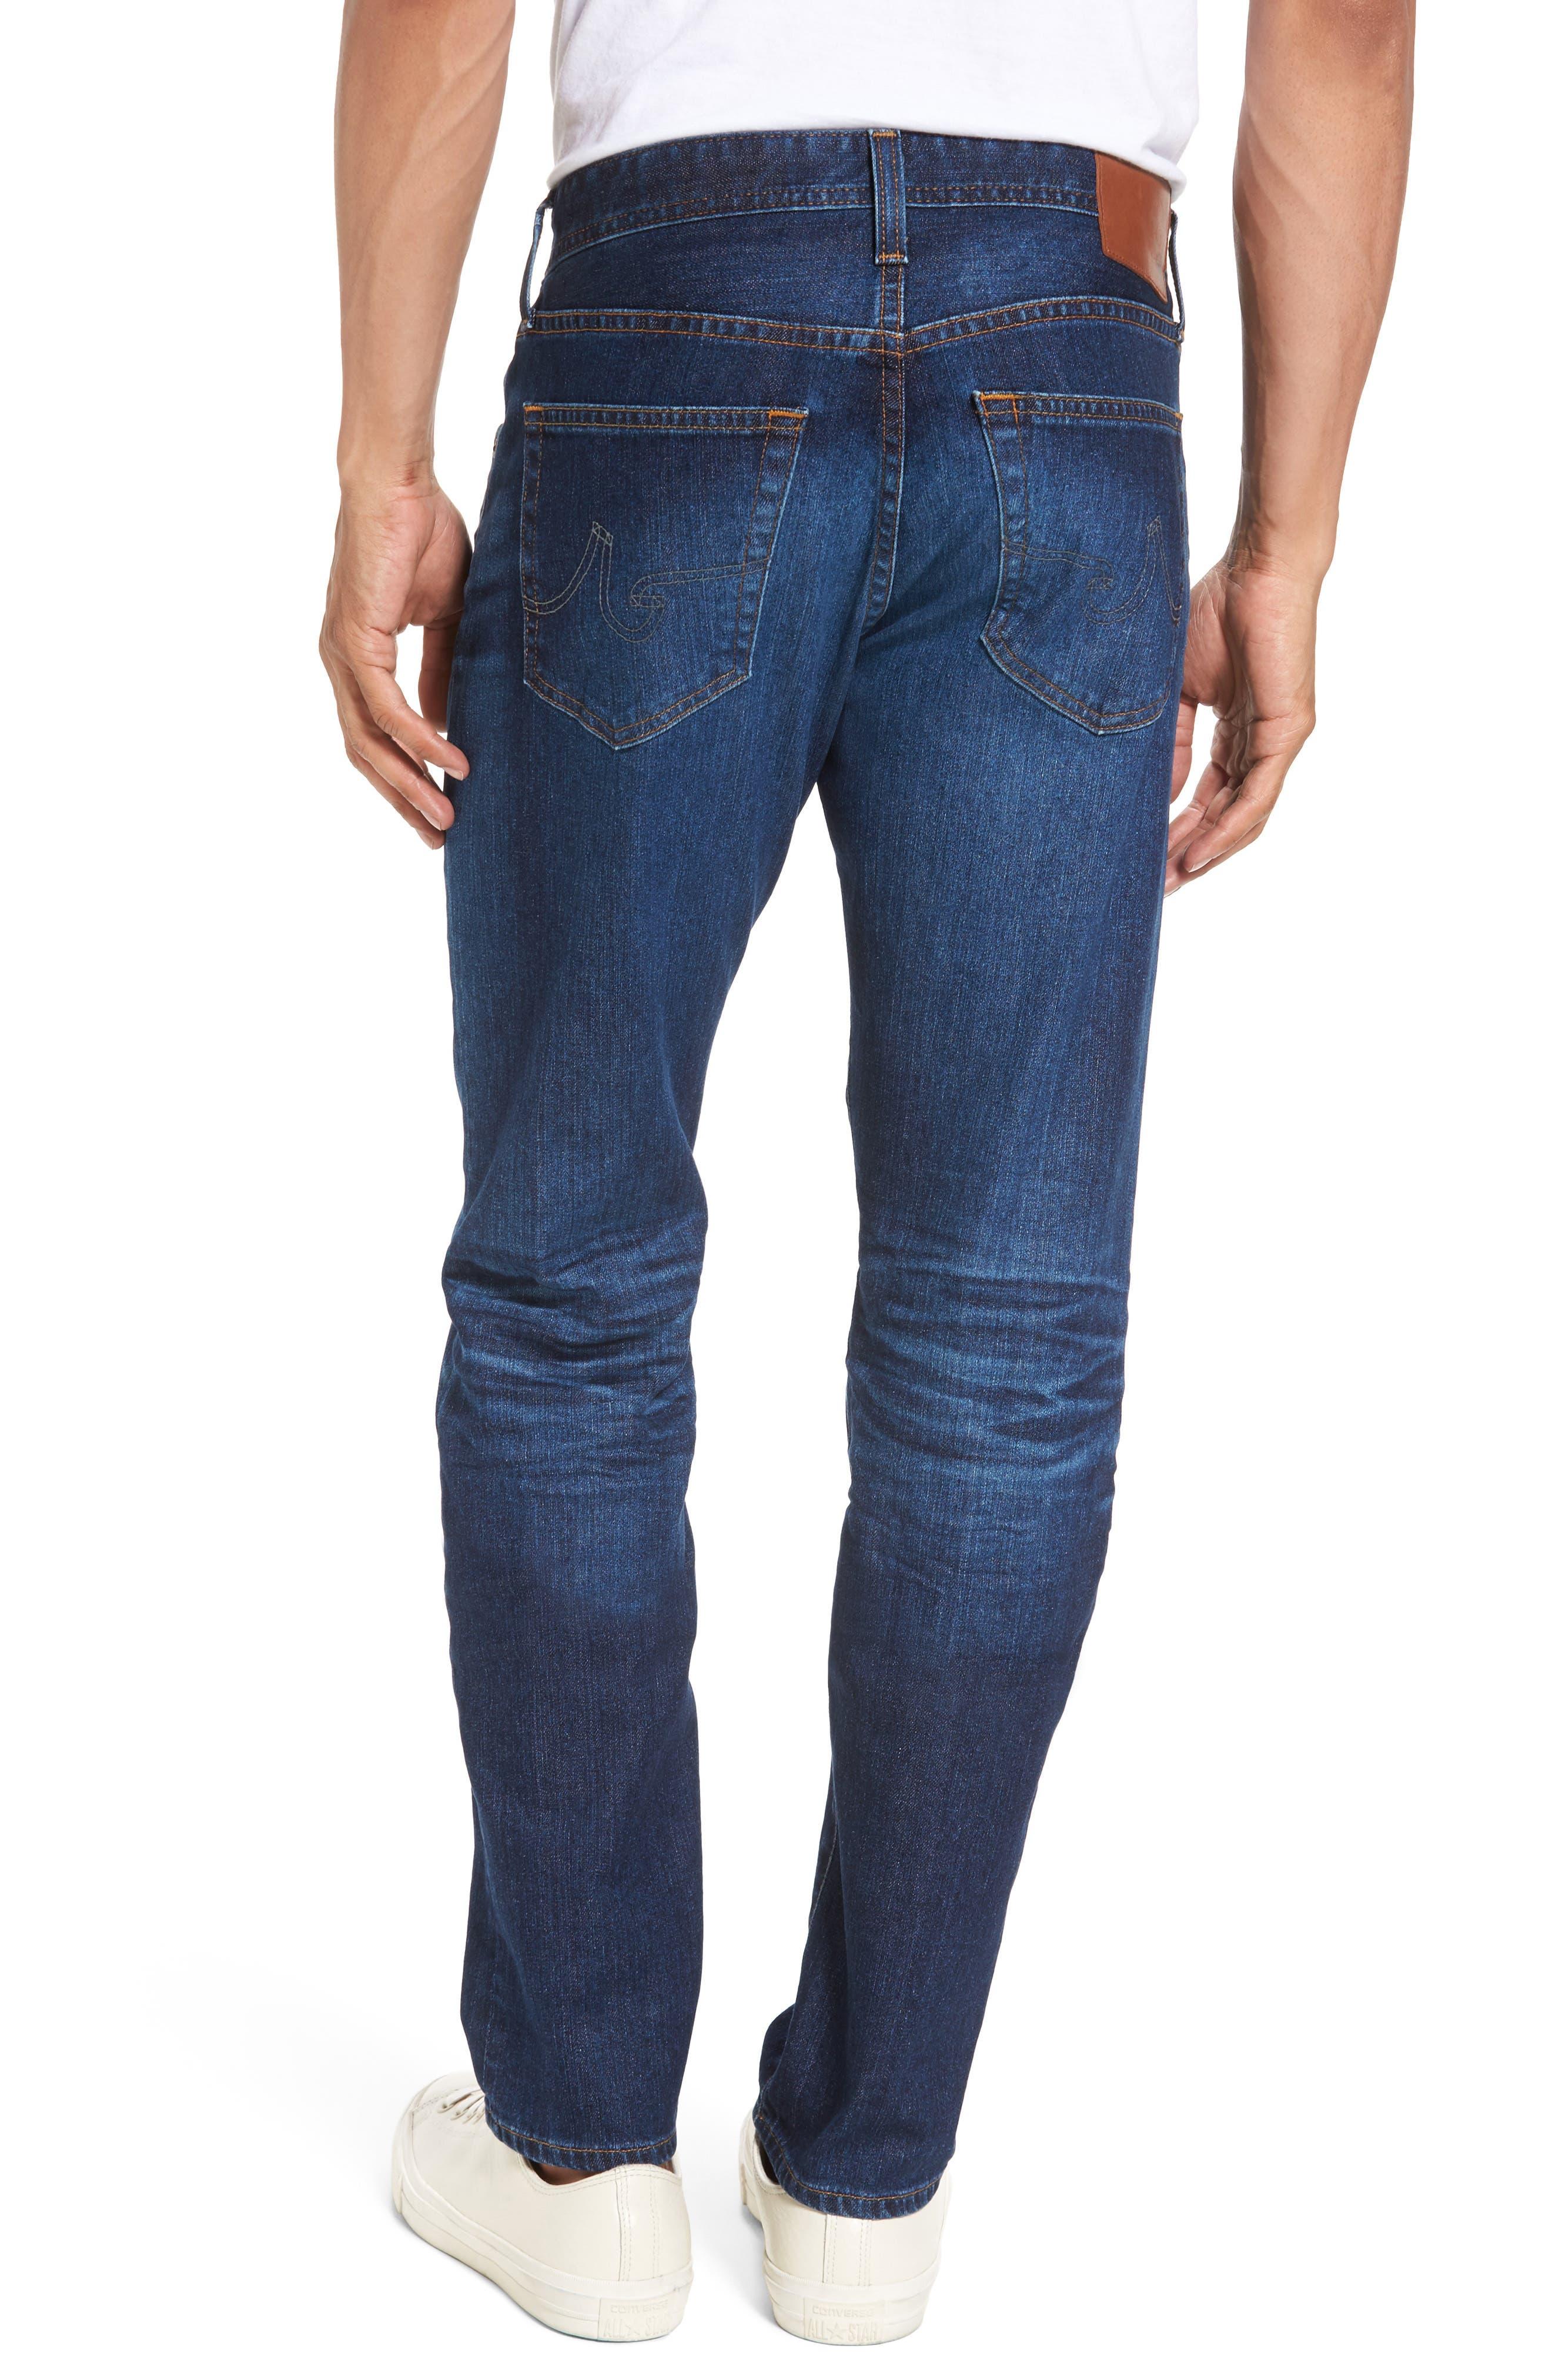 Tellis Slim Fit Jeans,                             Alternate thumbnail 2, color,                             451